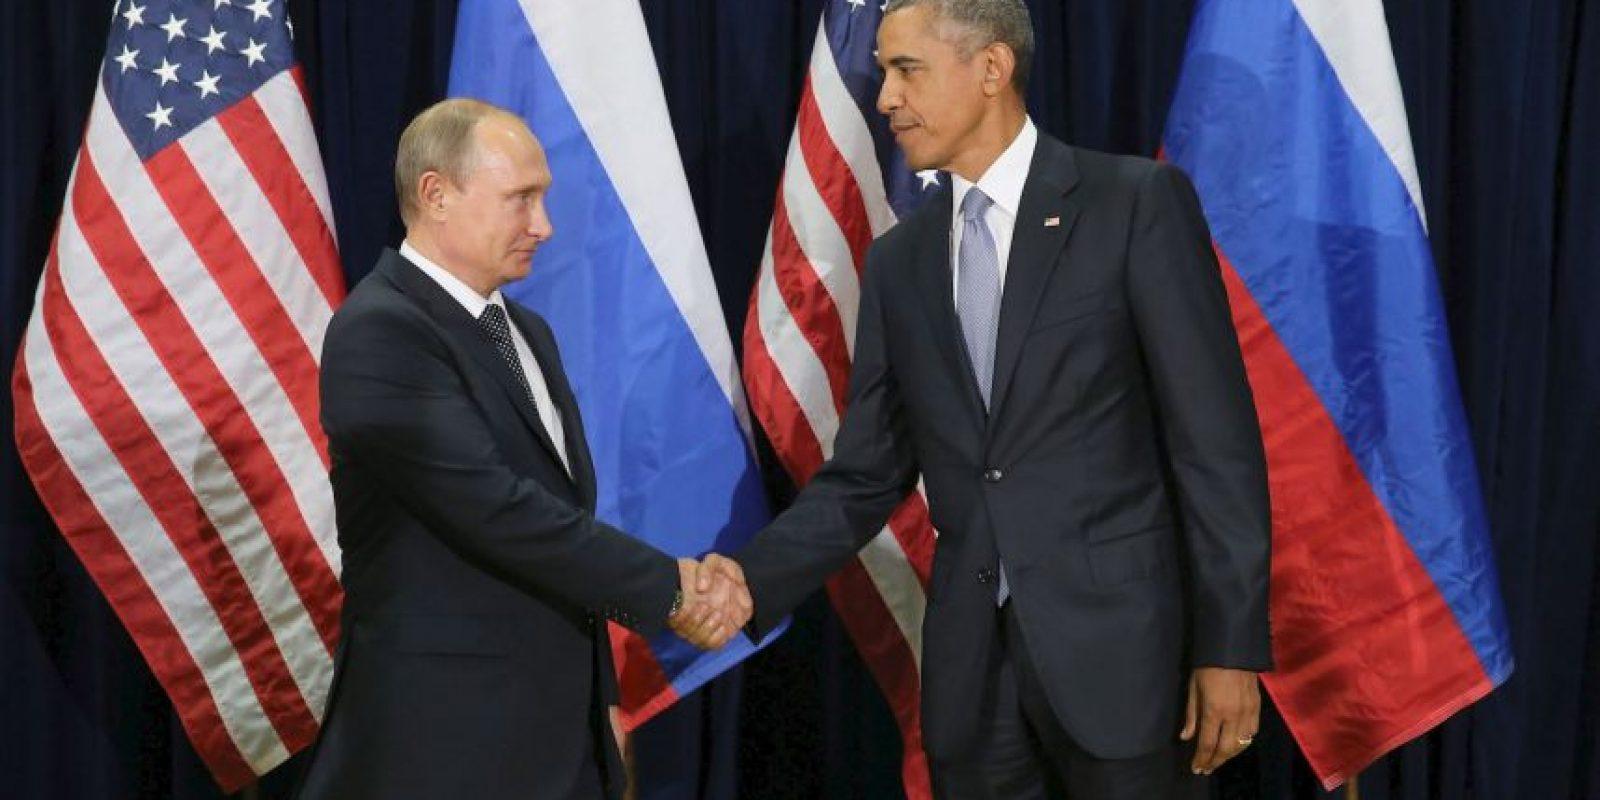 Donald Trump cree que Putin es mejor líder que Obama. Foto:Getty Images